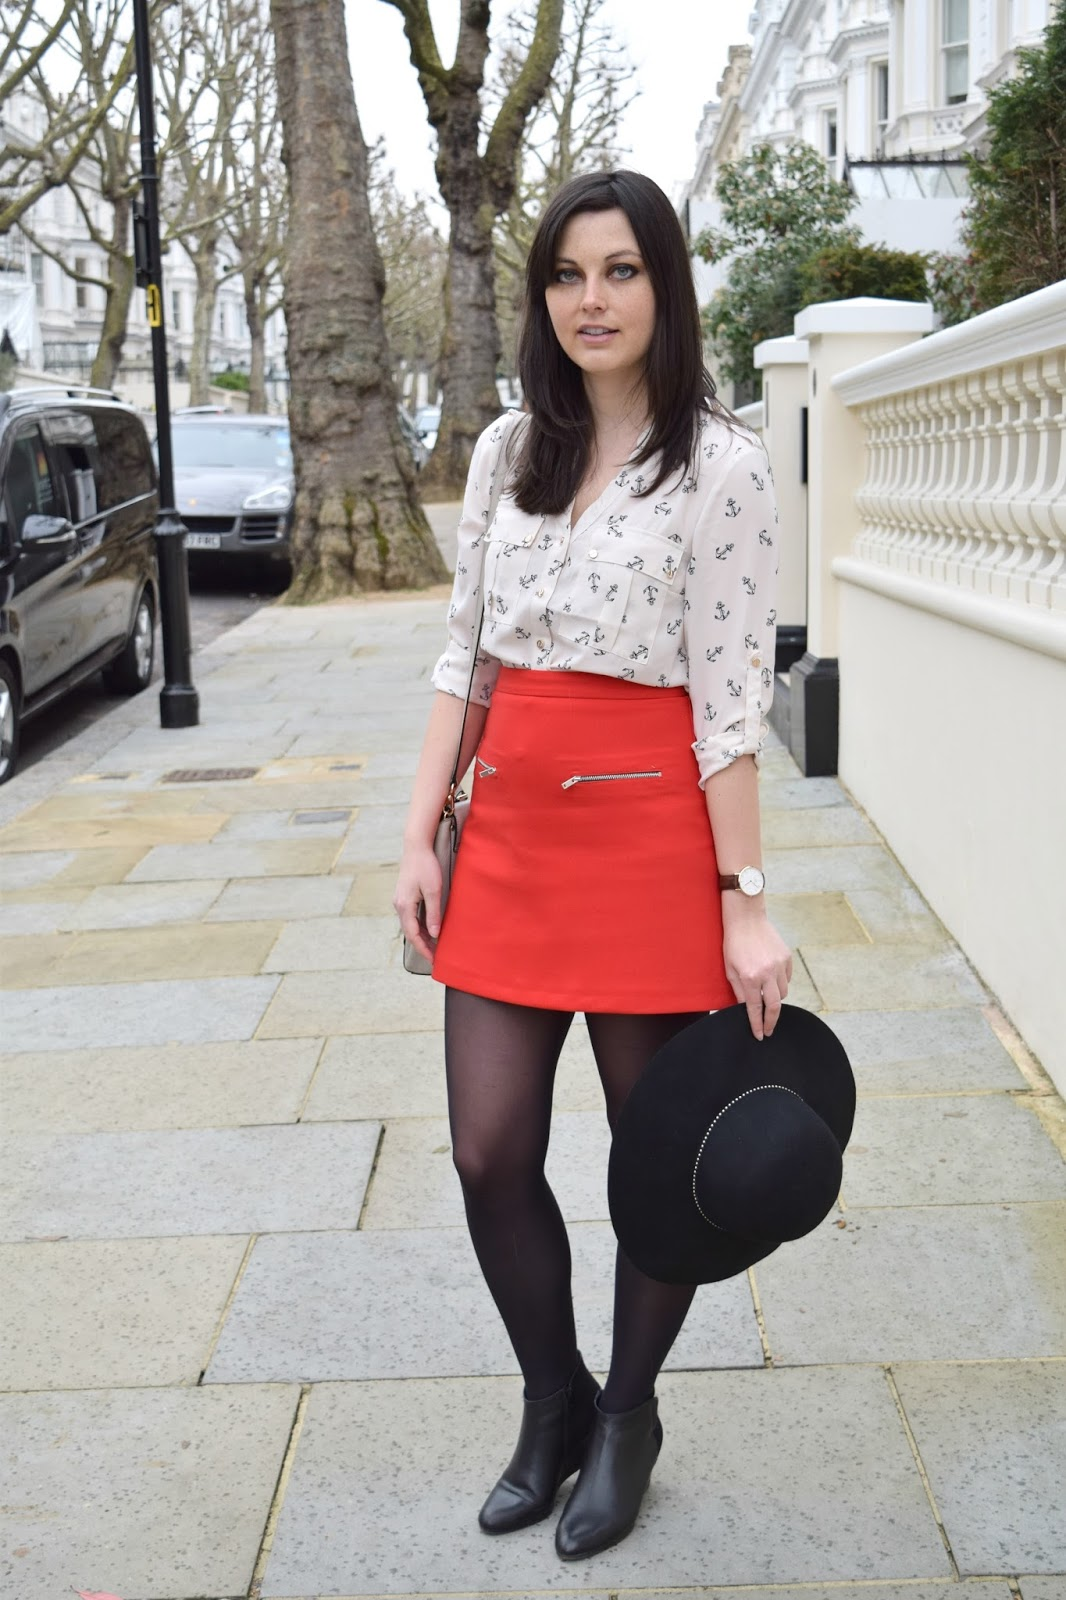 Kensington blogger fashion post